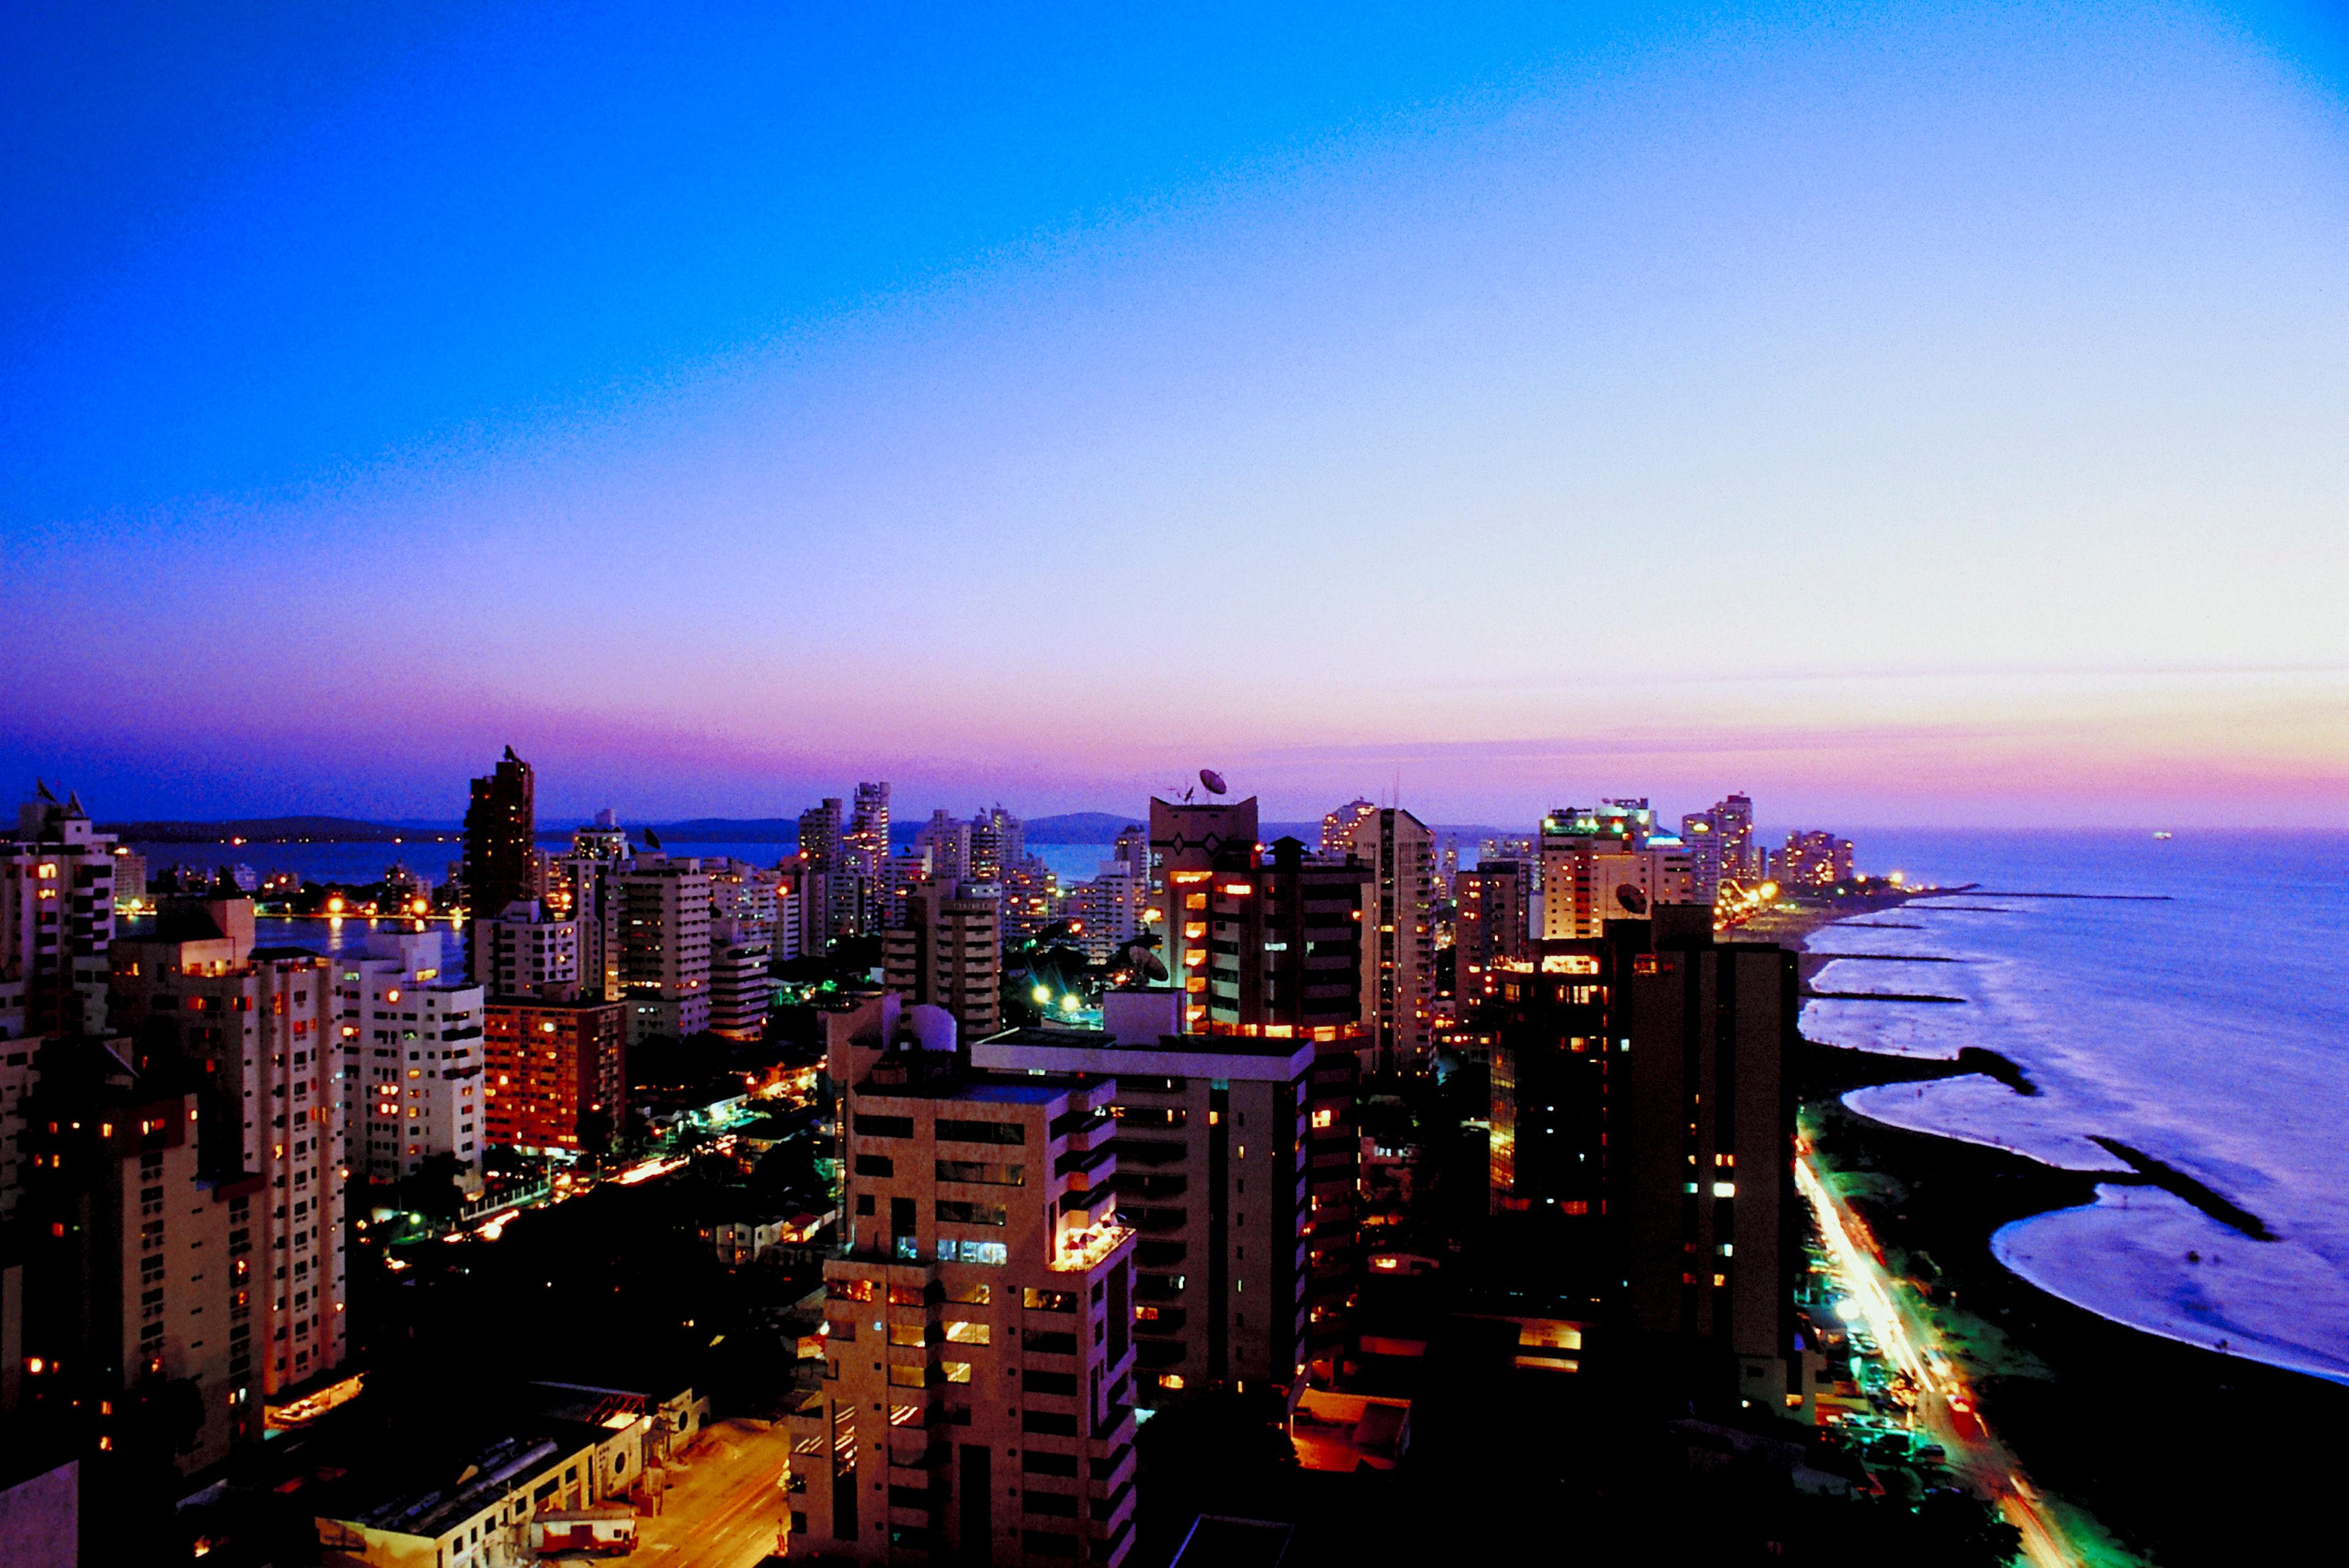 Cityscape of Cartagena Columbia at dusk